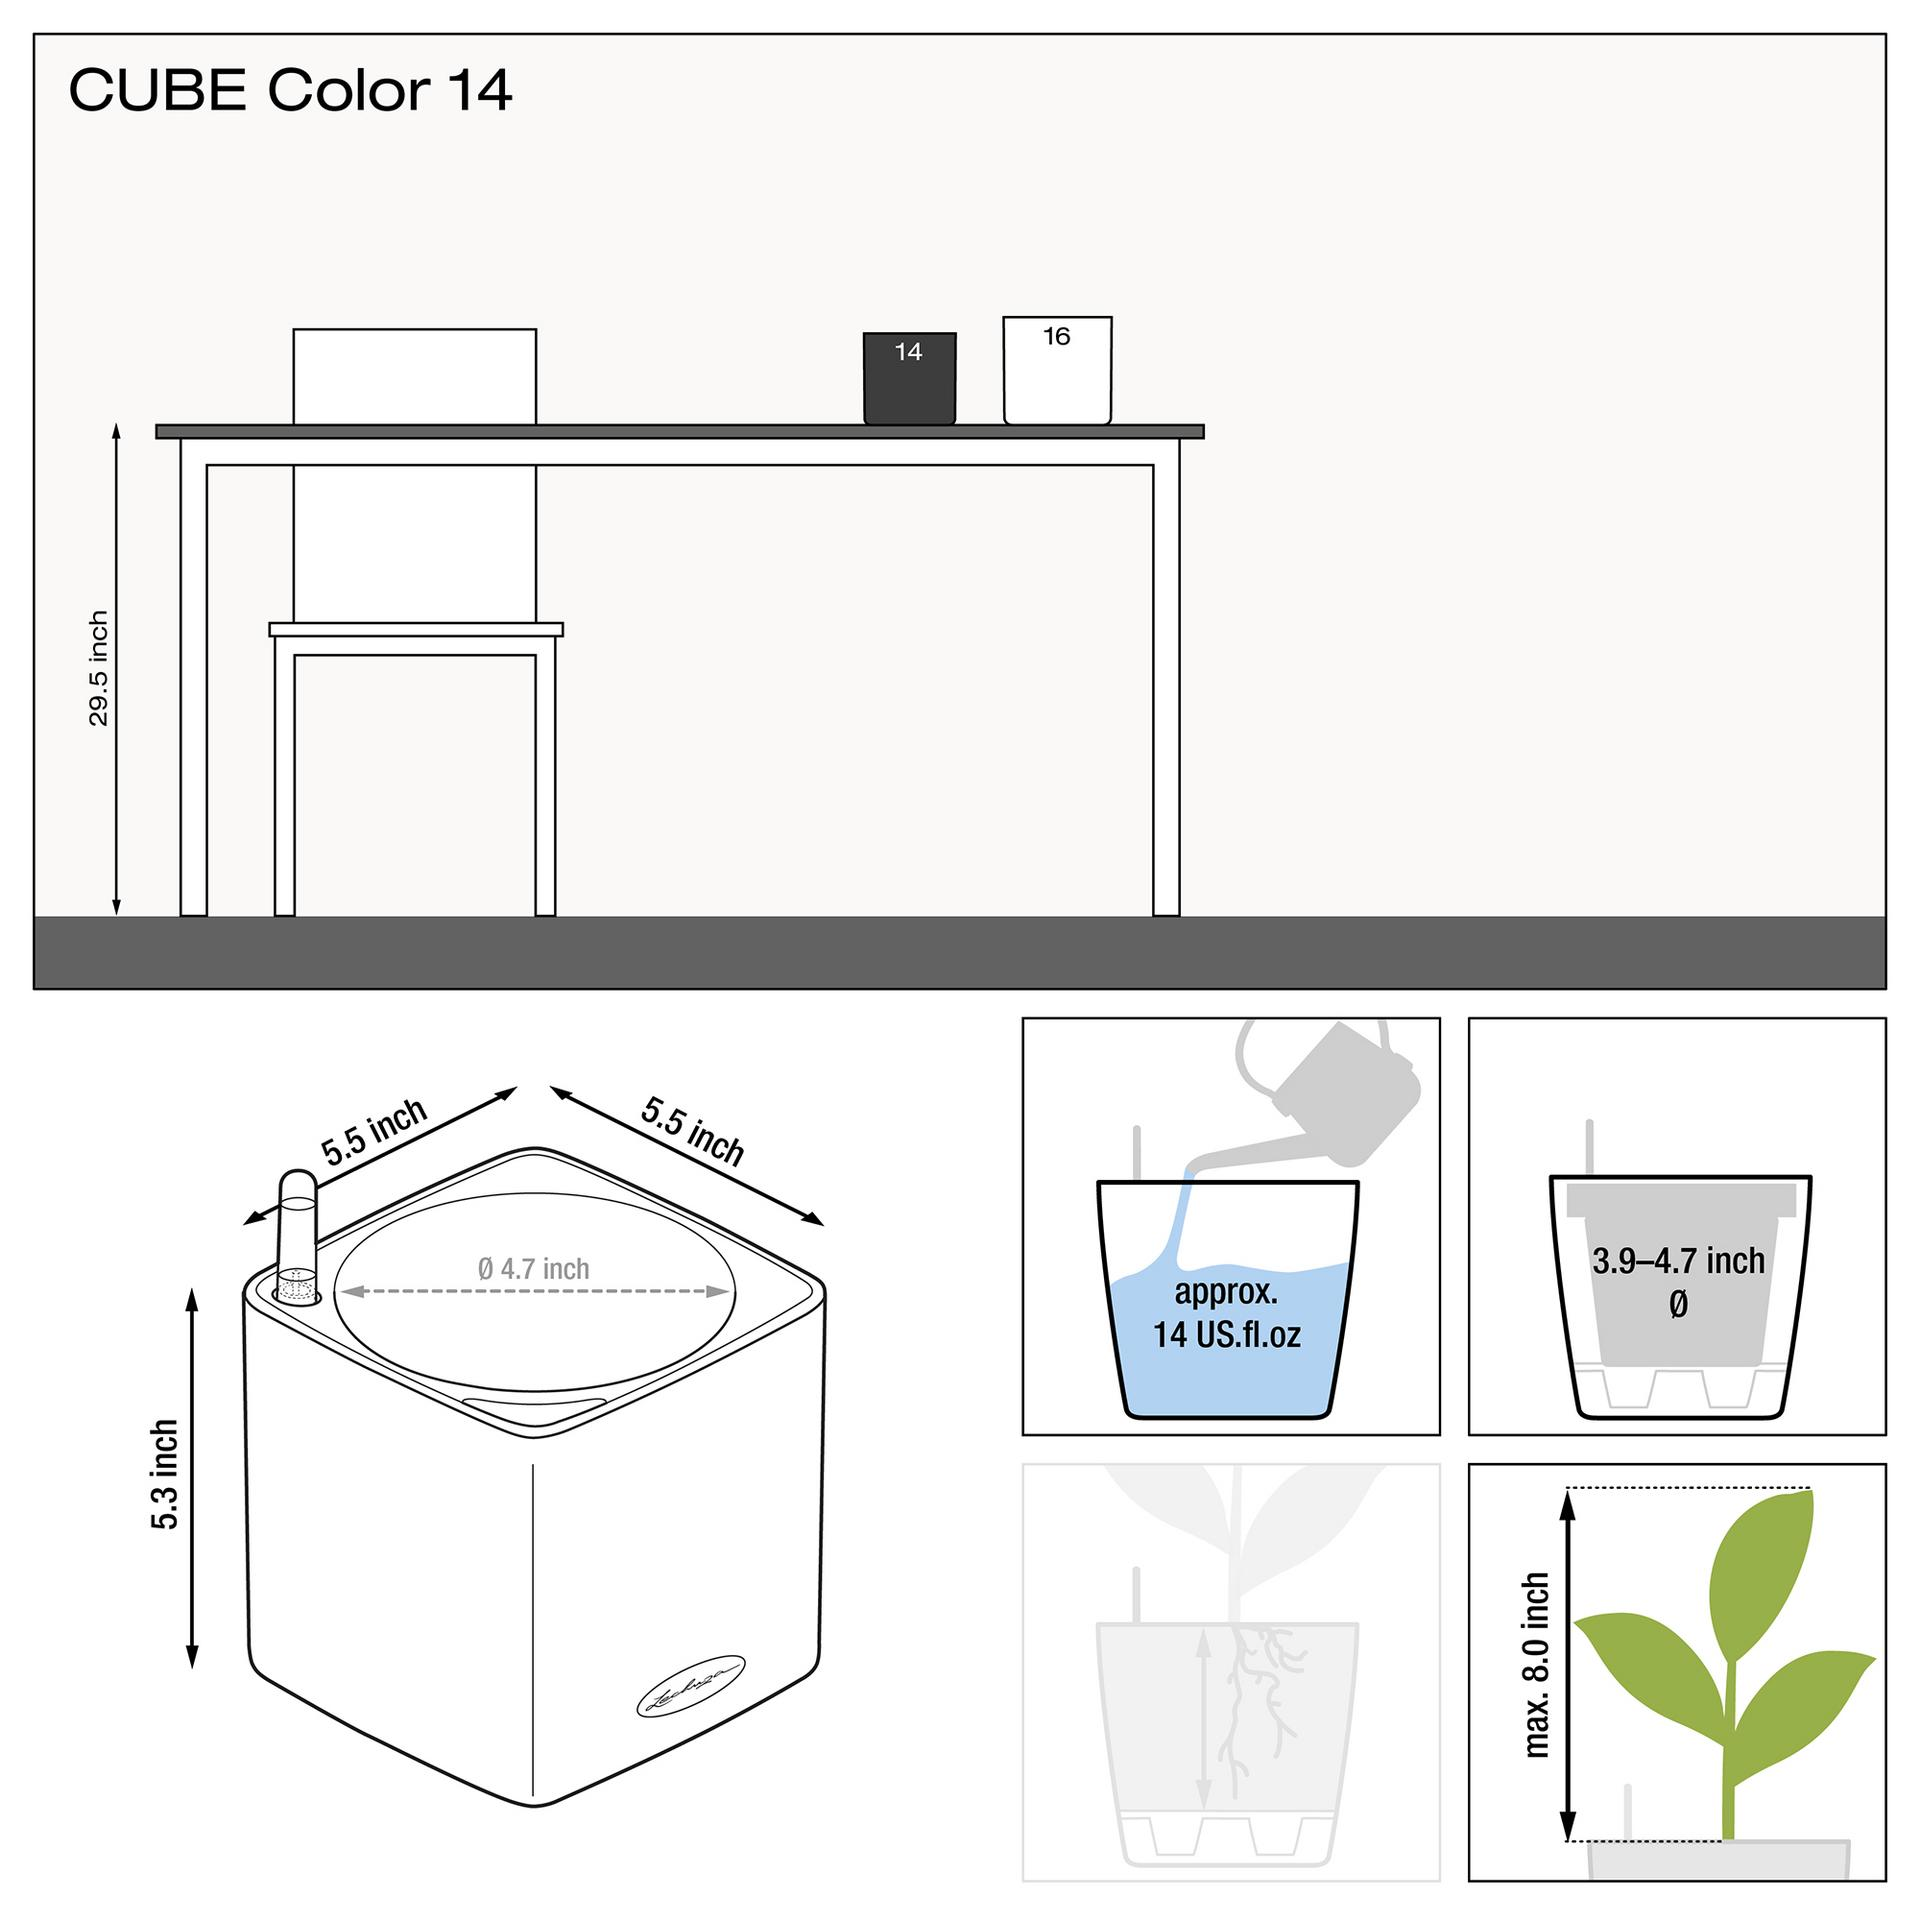 le_cube-color14_product_addi_nz_us